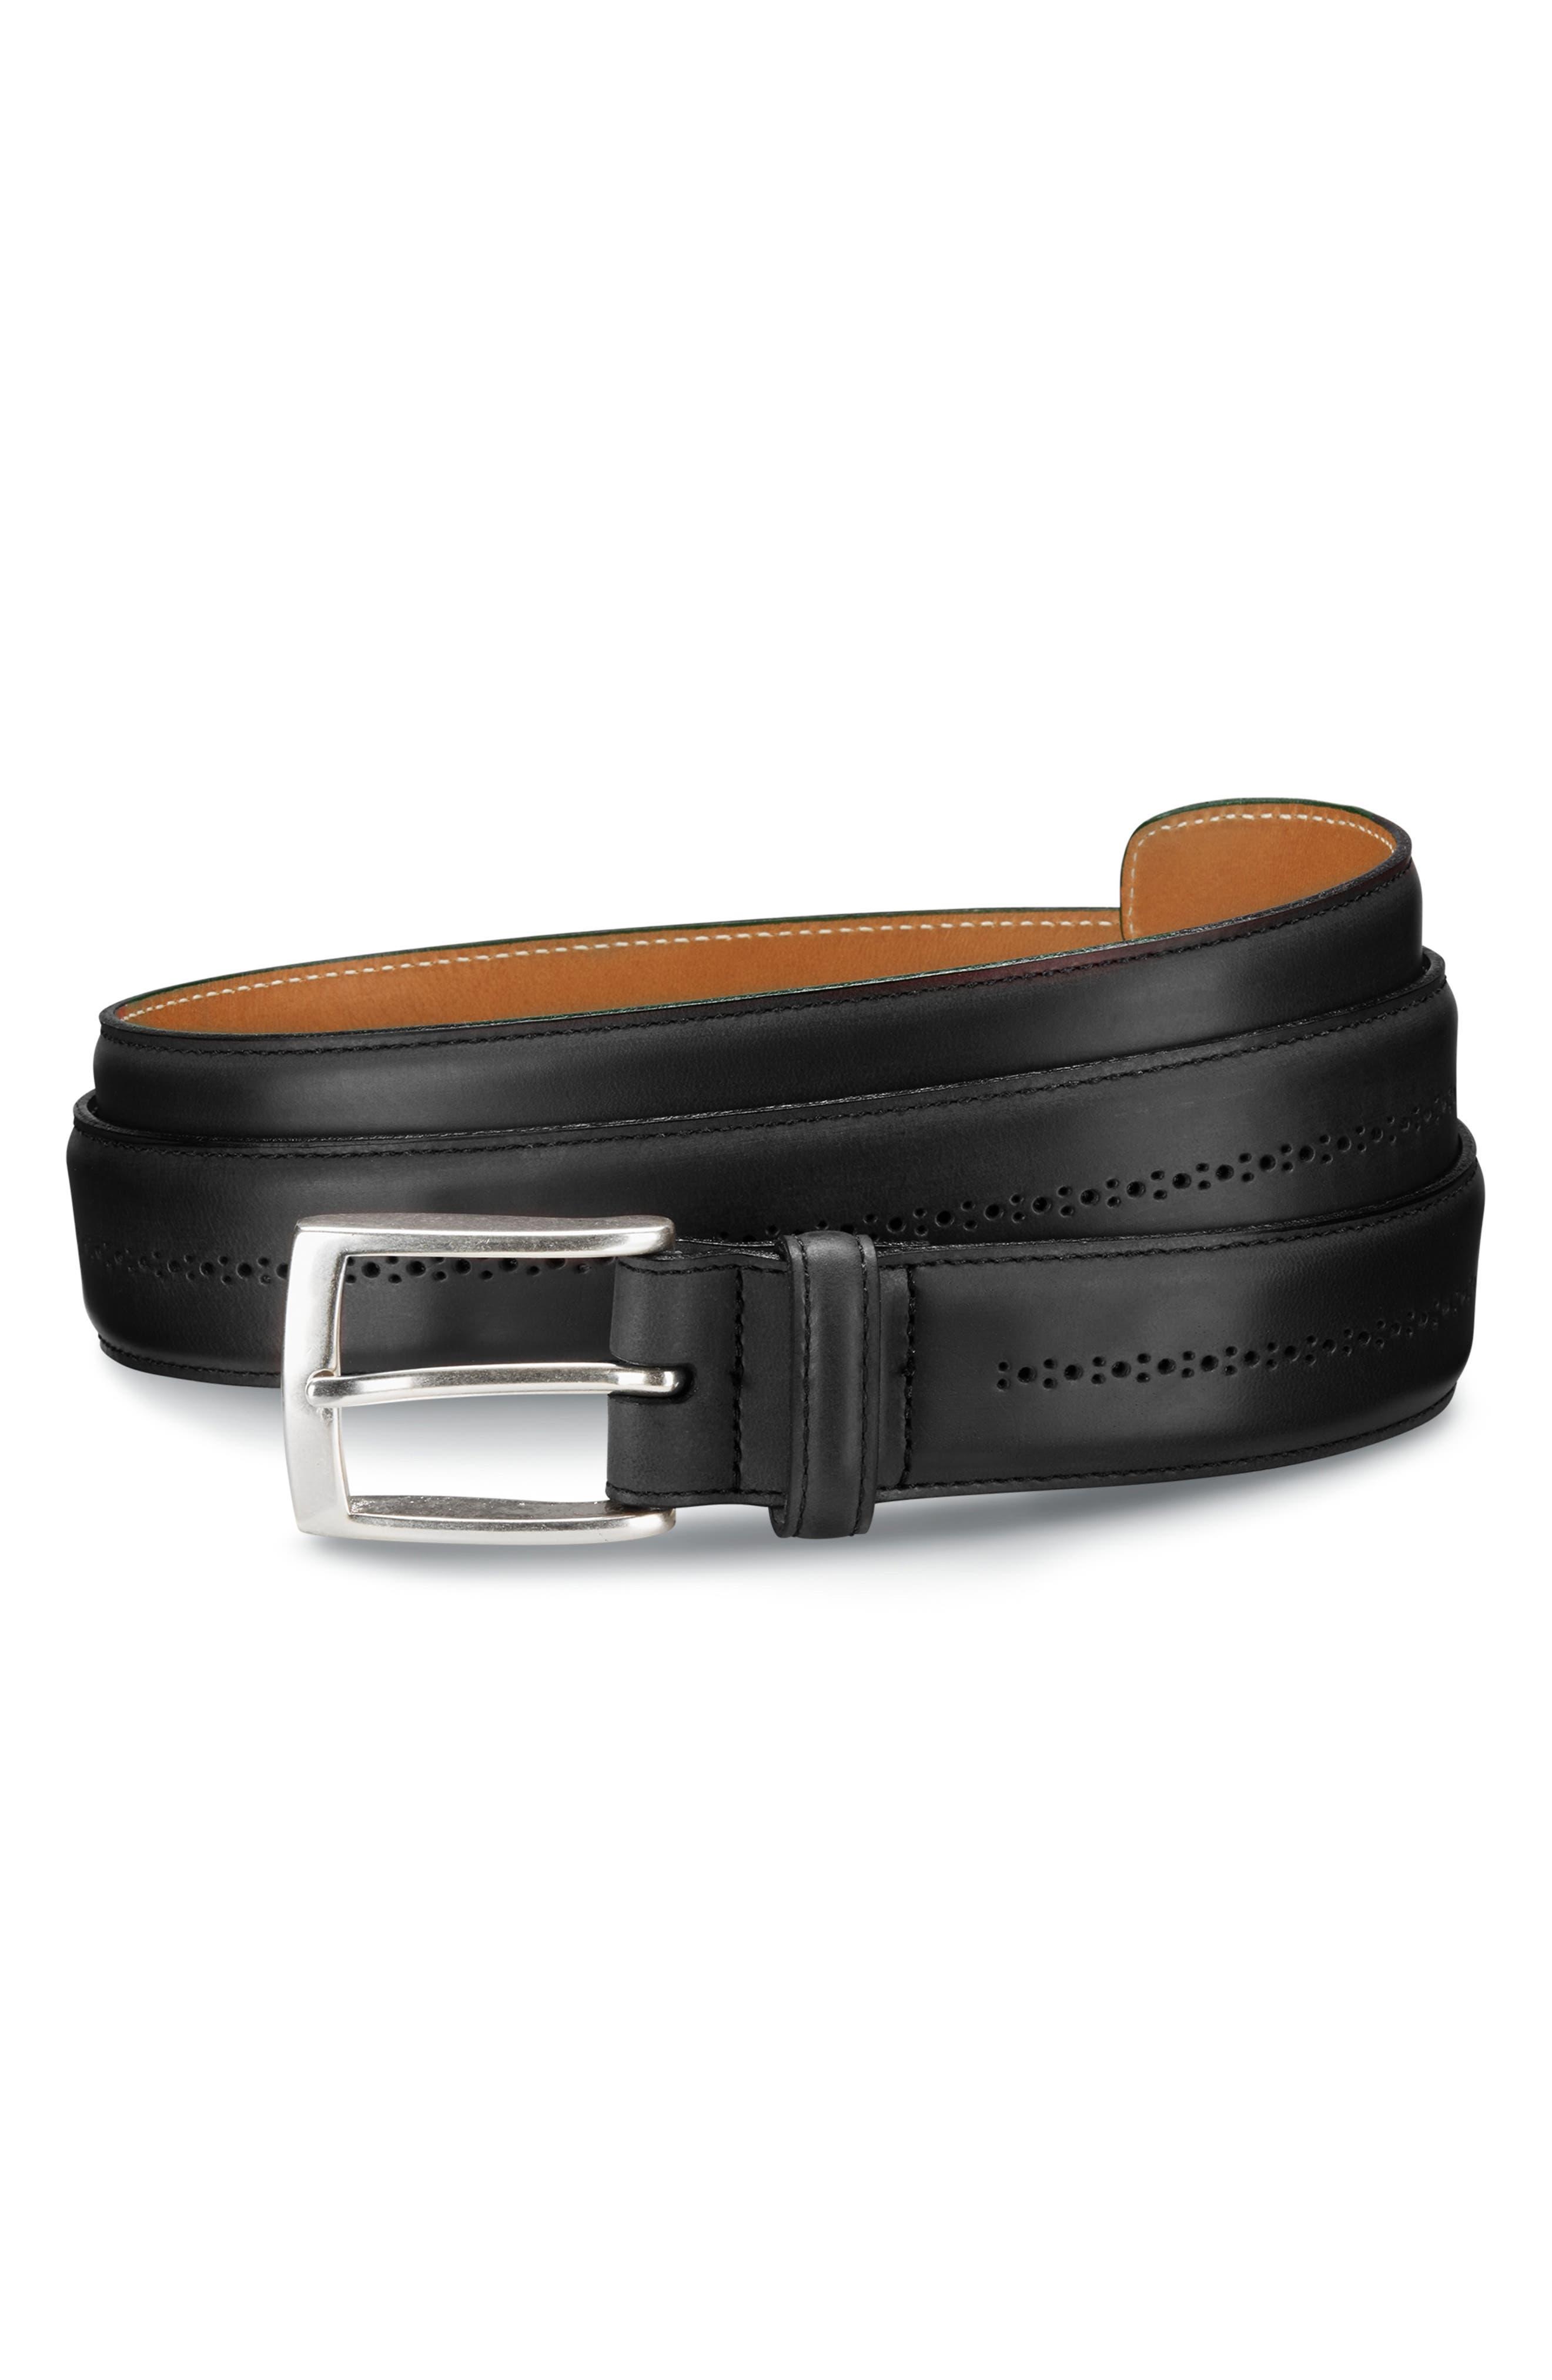 ALLEN EDMONDS Mackey Ave Leather Belt, Main, color, 001